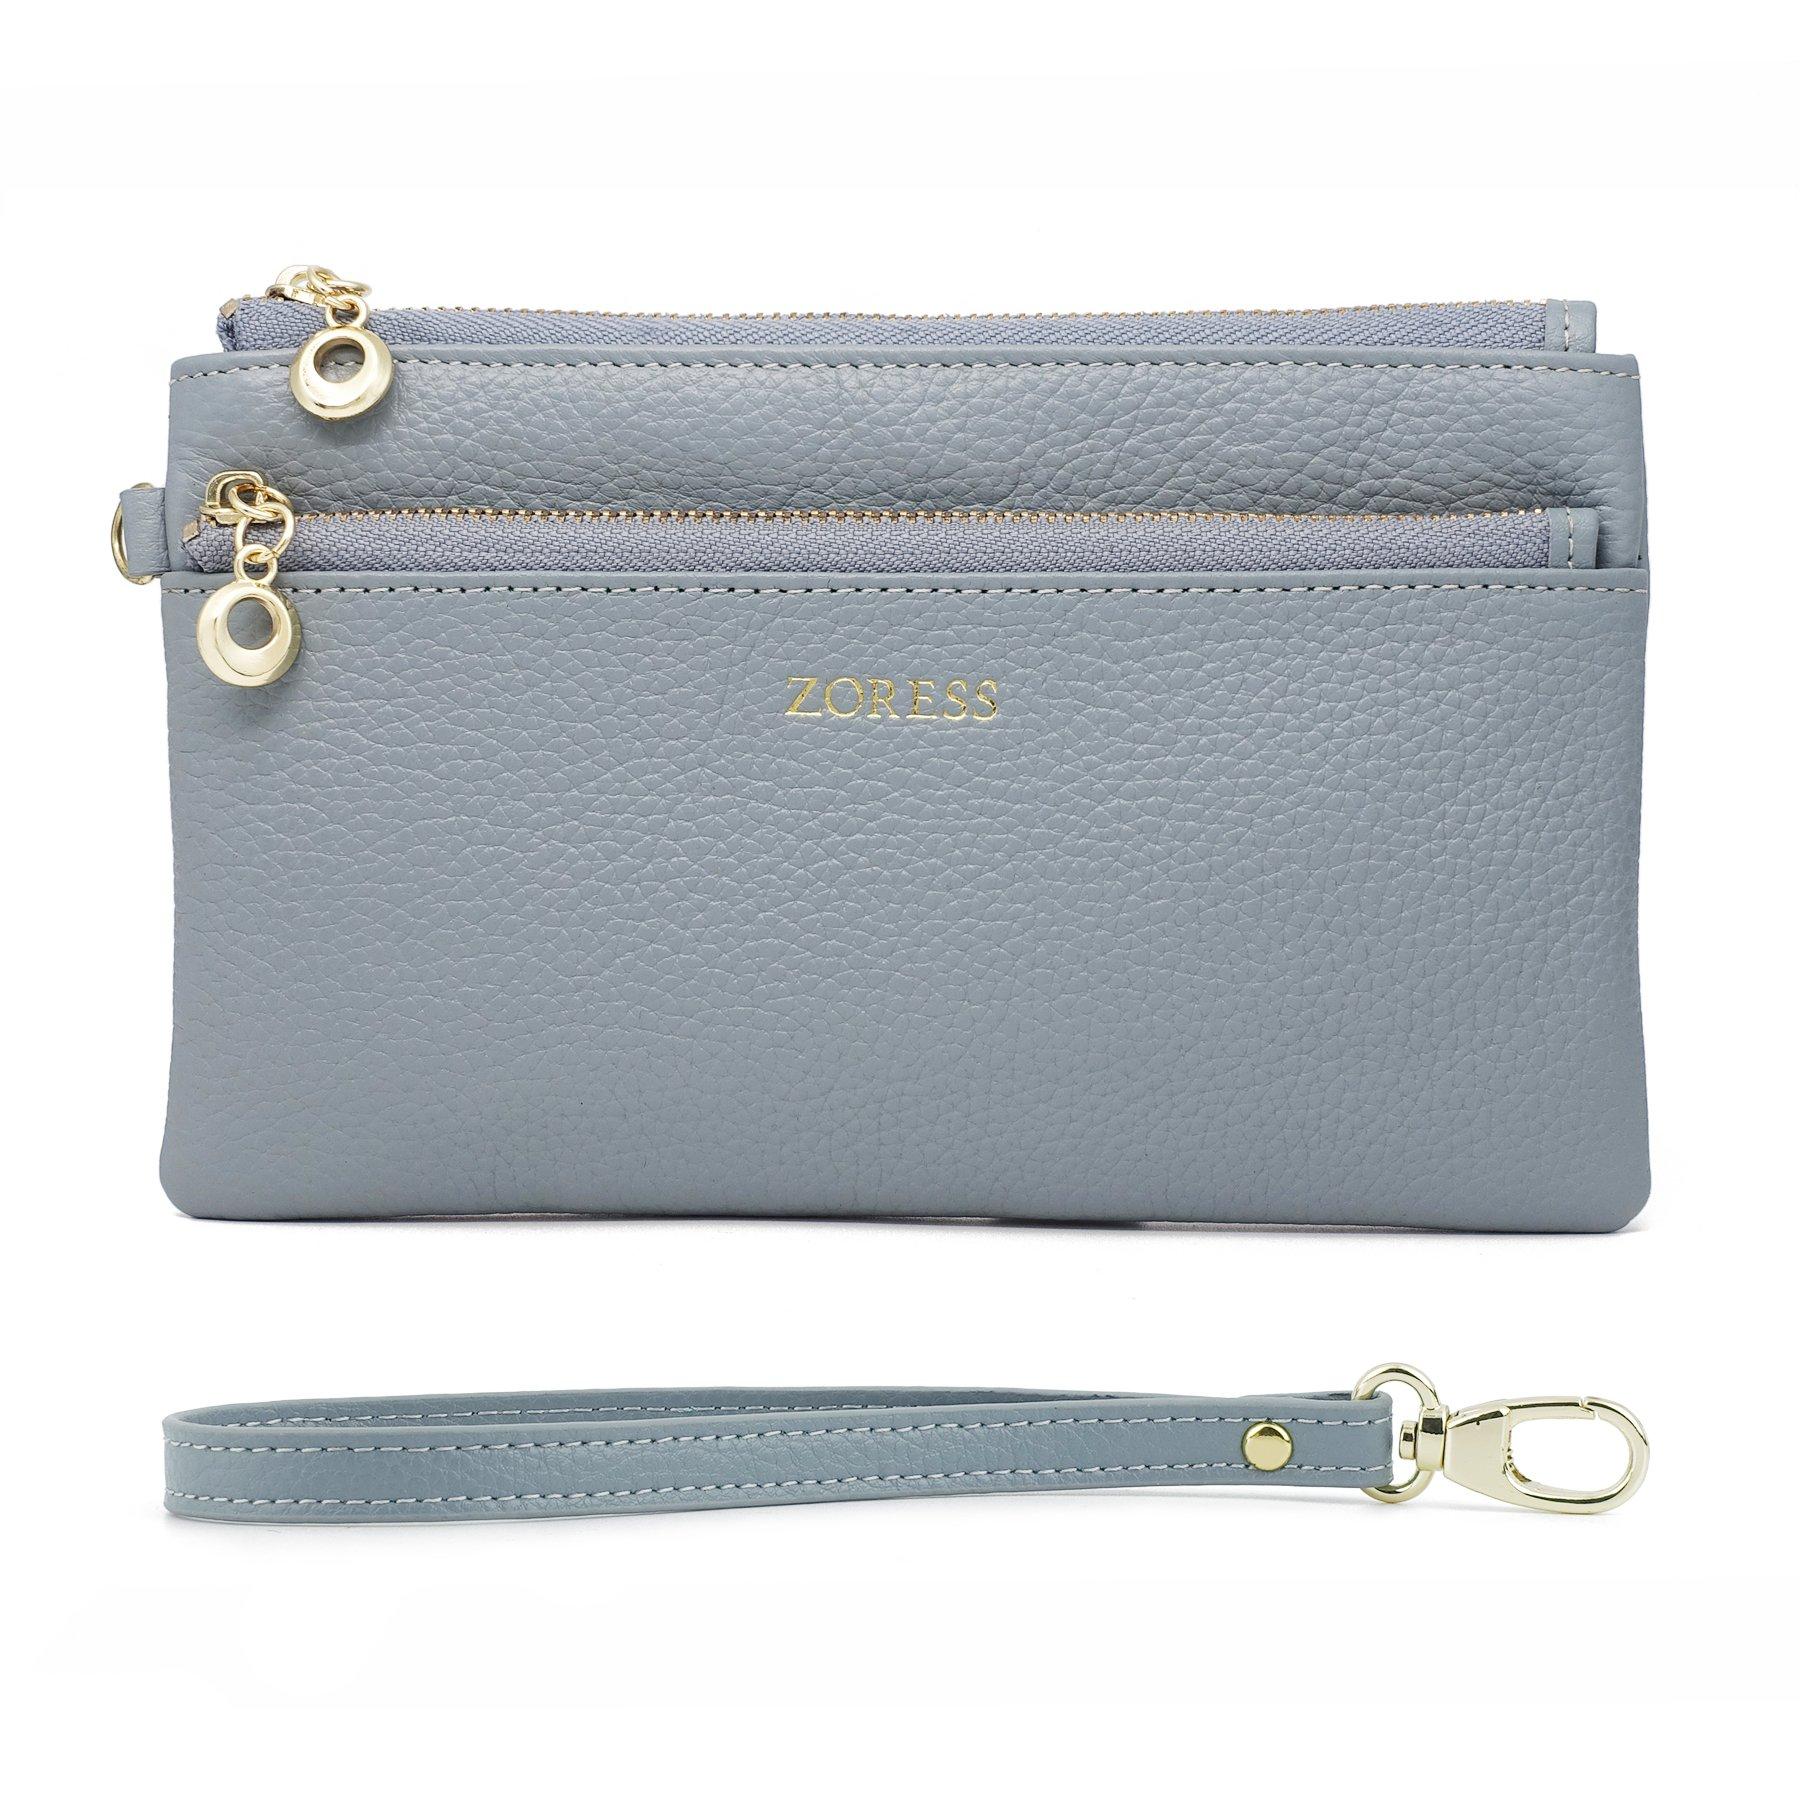 ZORESS Women Genuine Leather Wristlets Bag, Clutch Organizer Wallets Purses for iPhone(Blue Long)